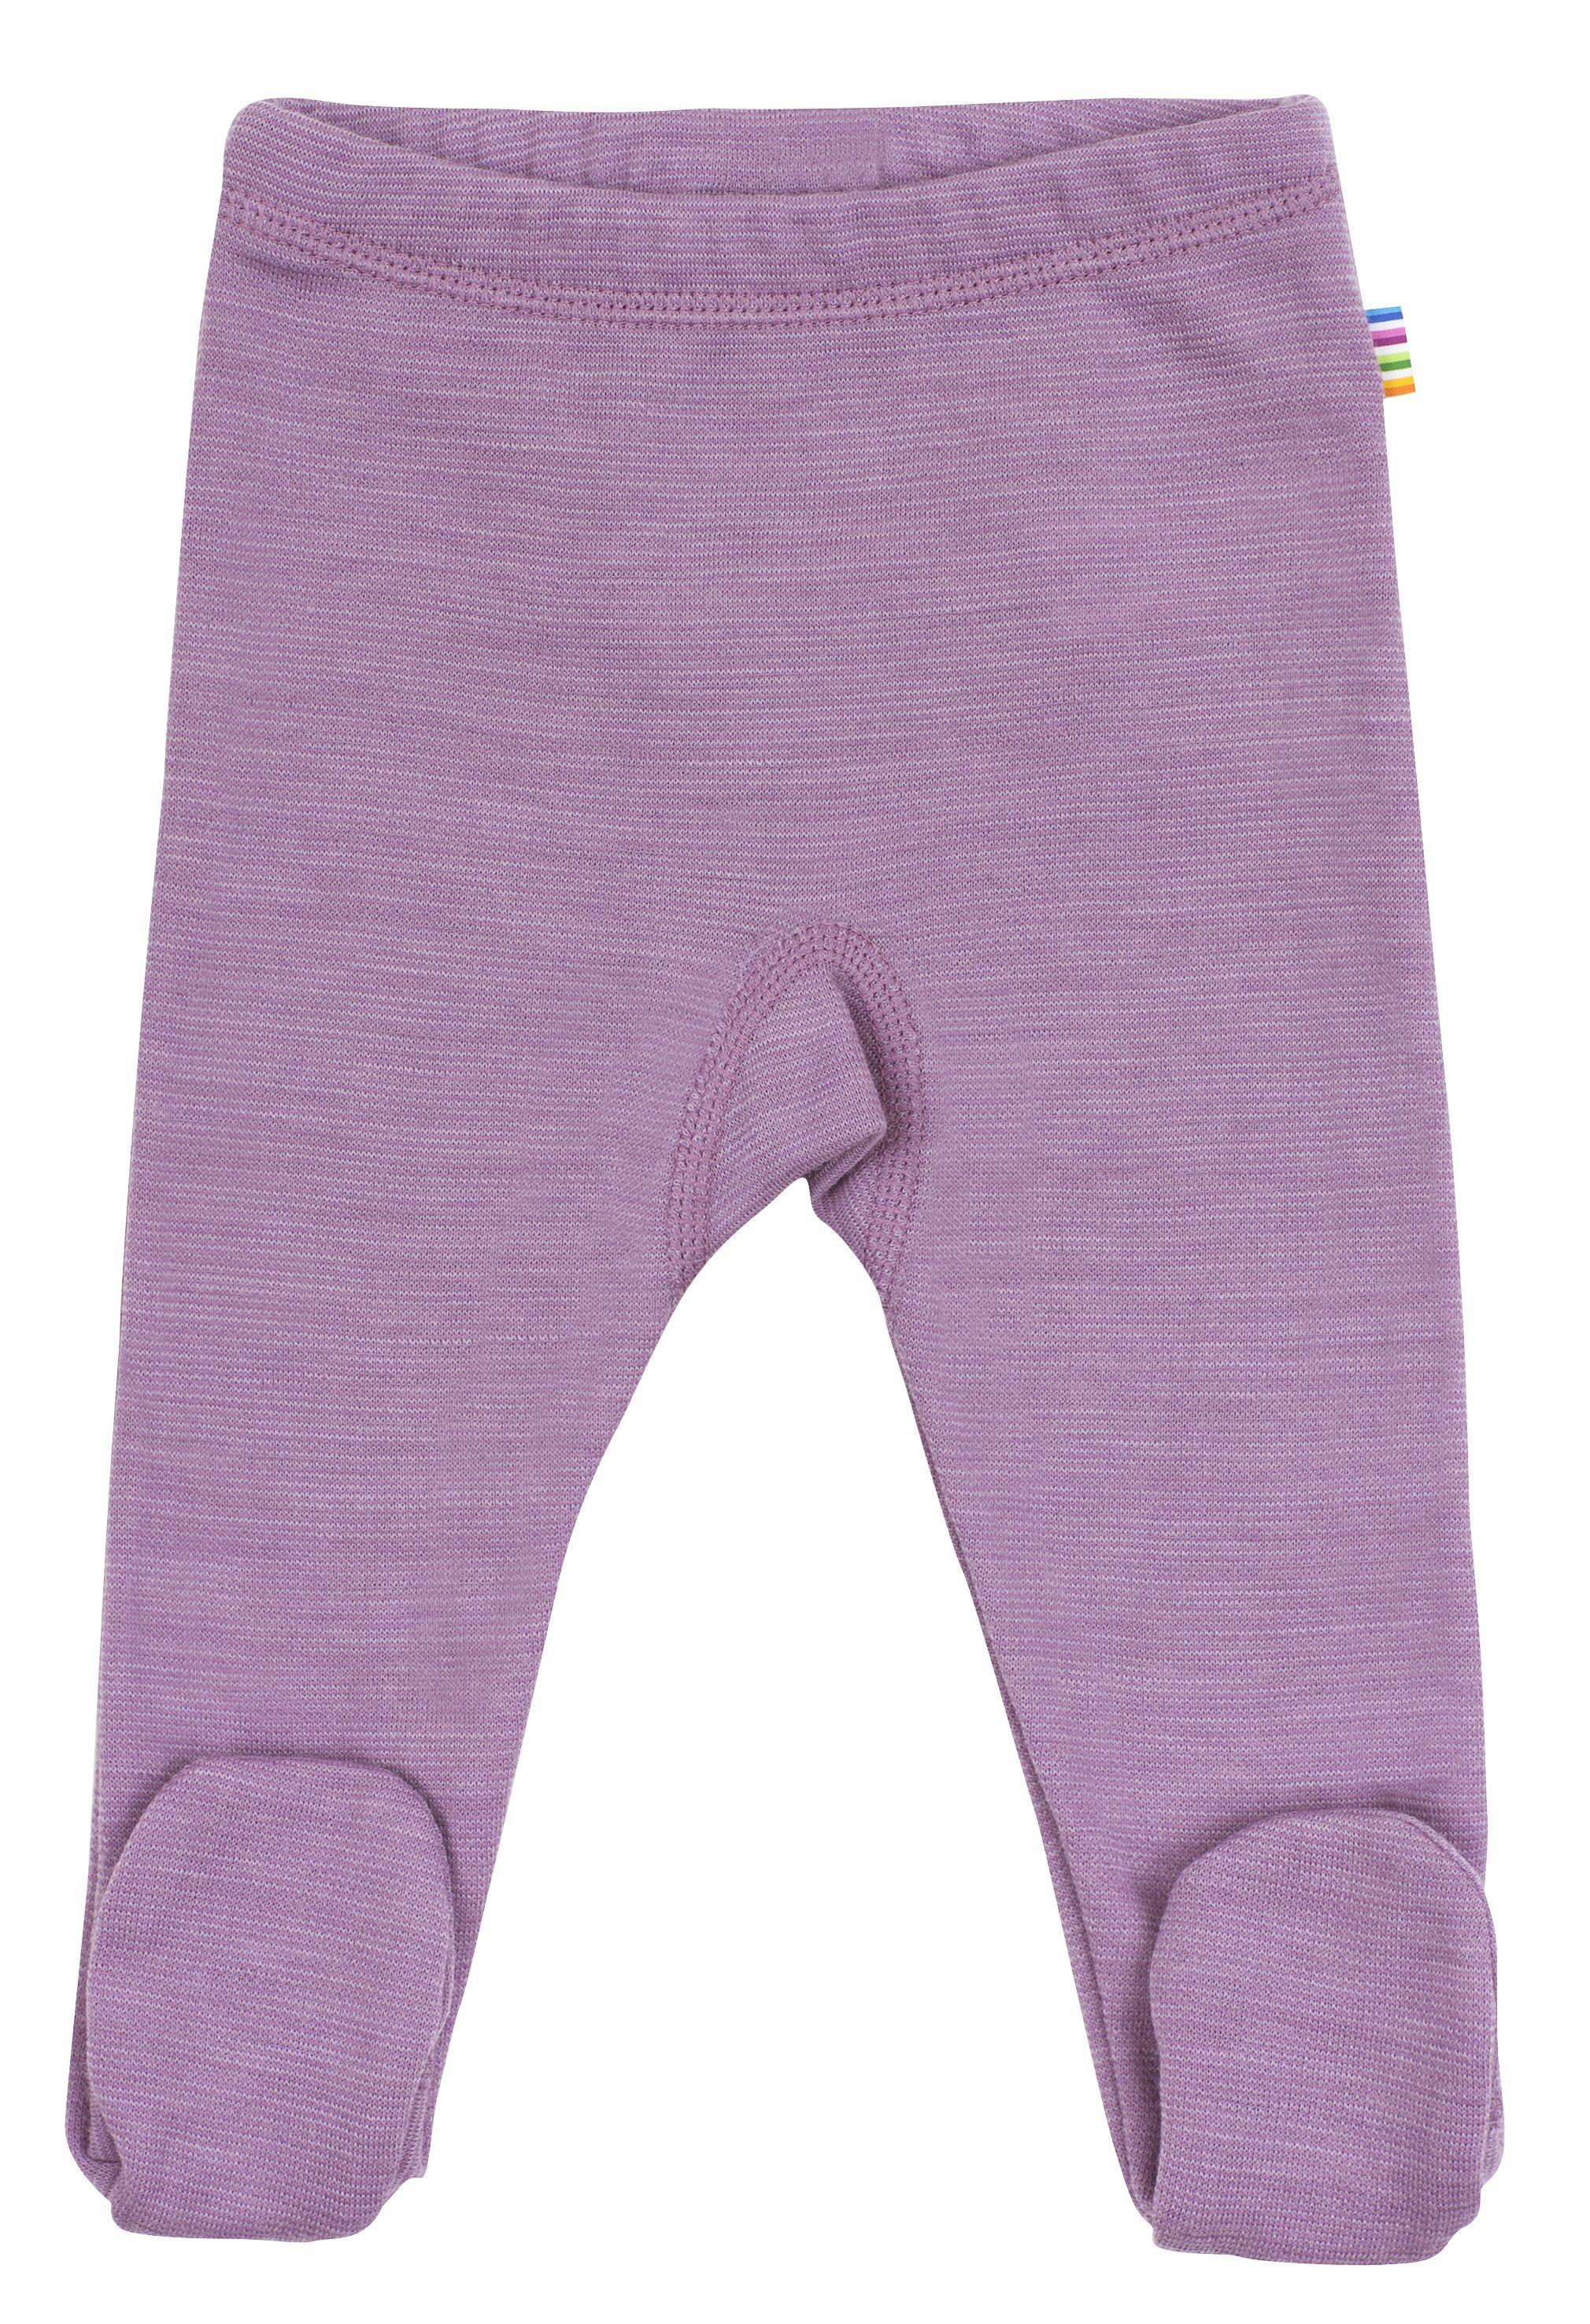 Image of   Leggings m. fod fra Joha i uld i Lavendel